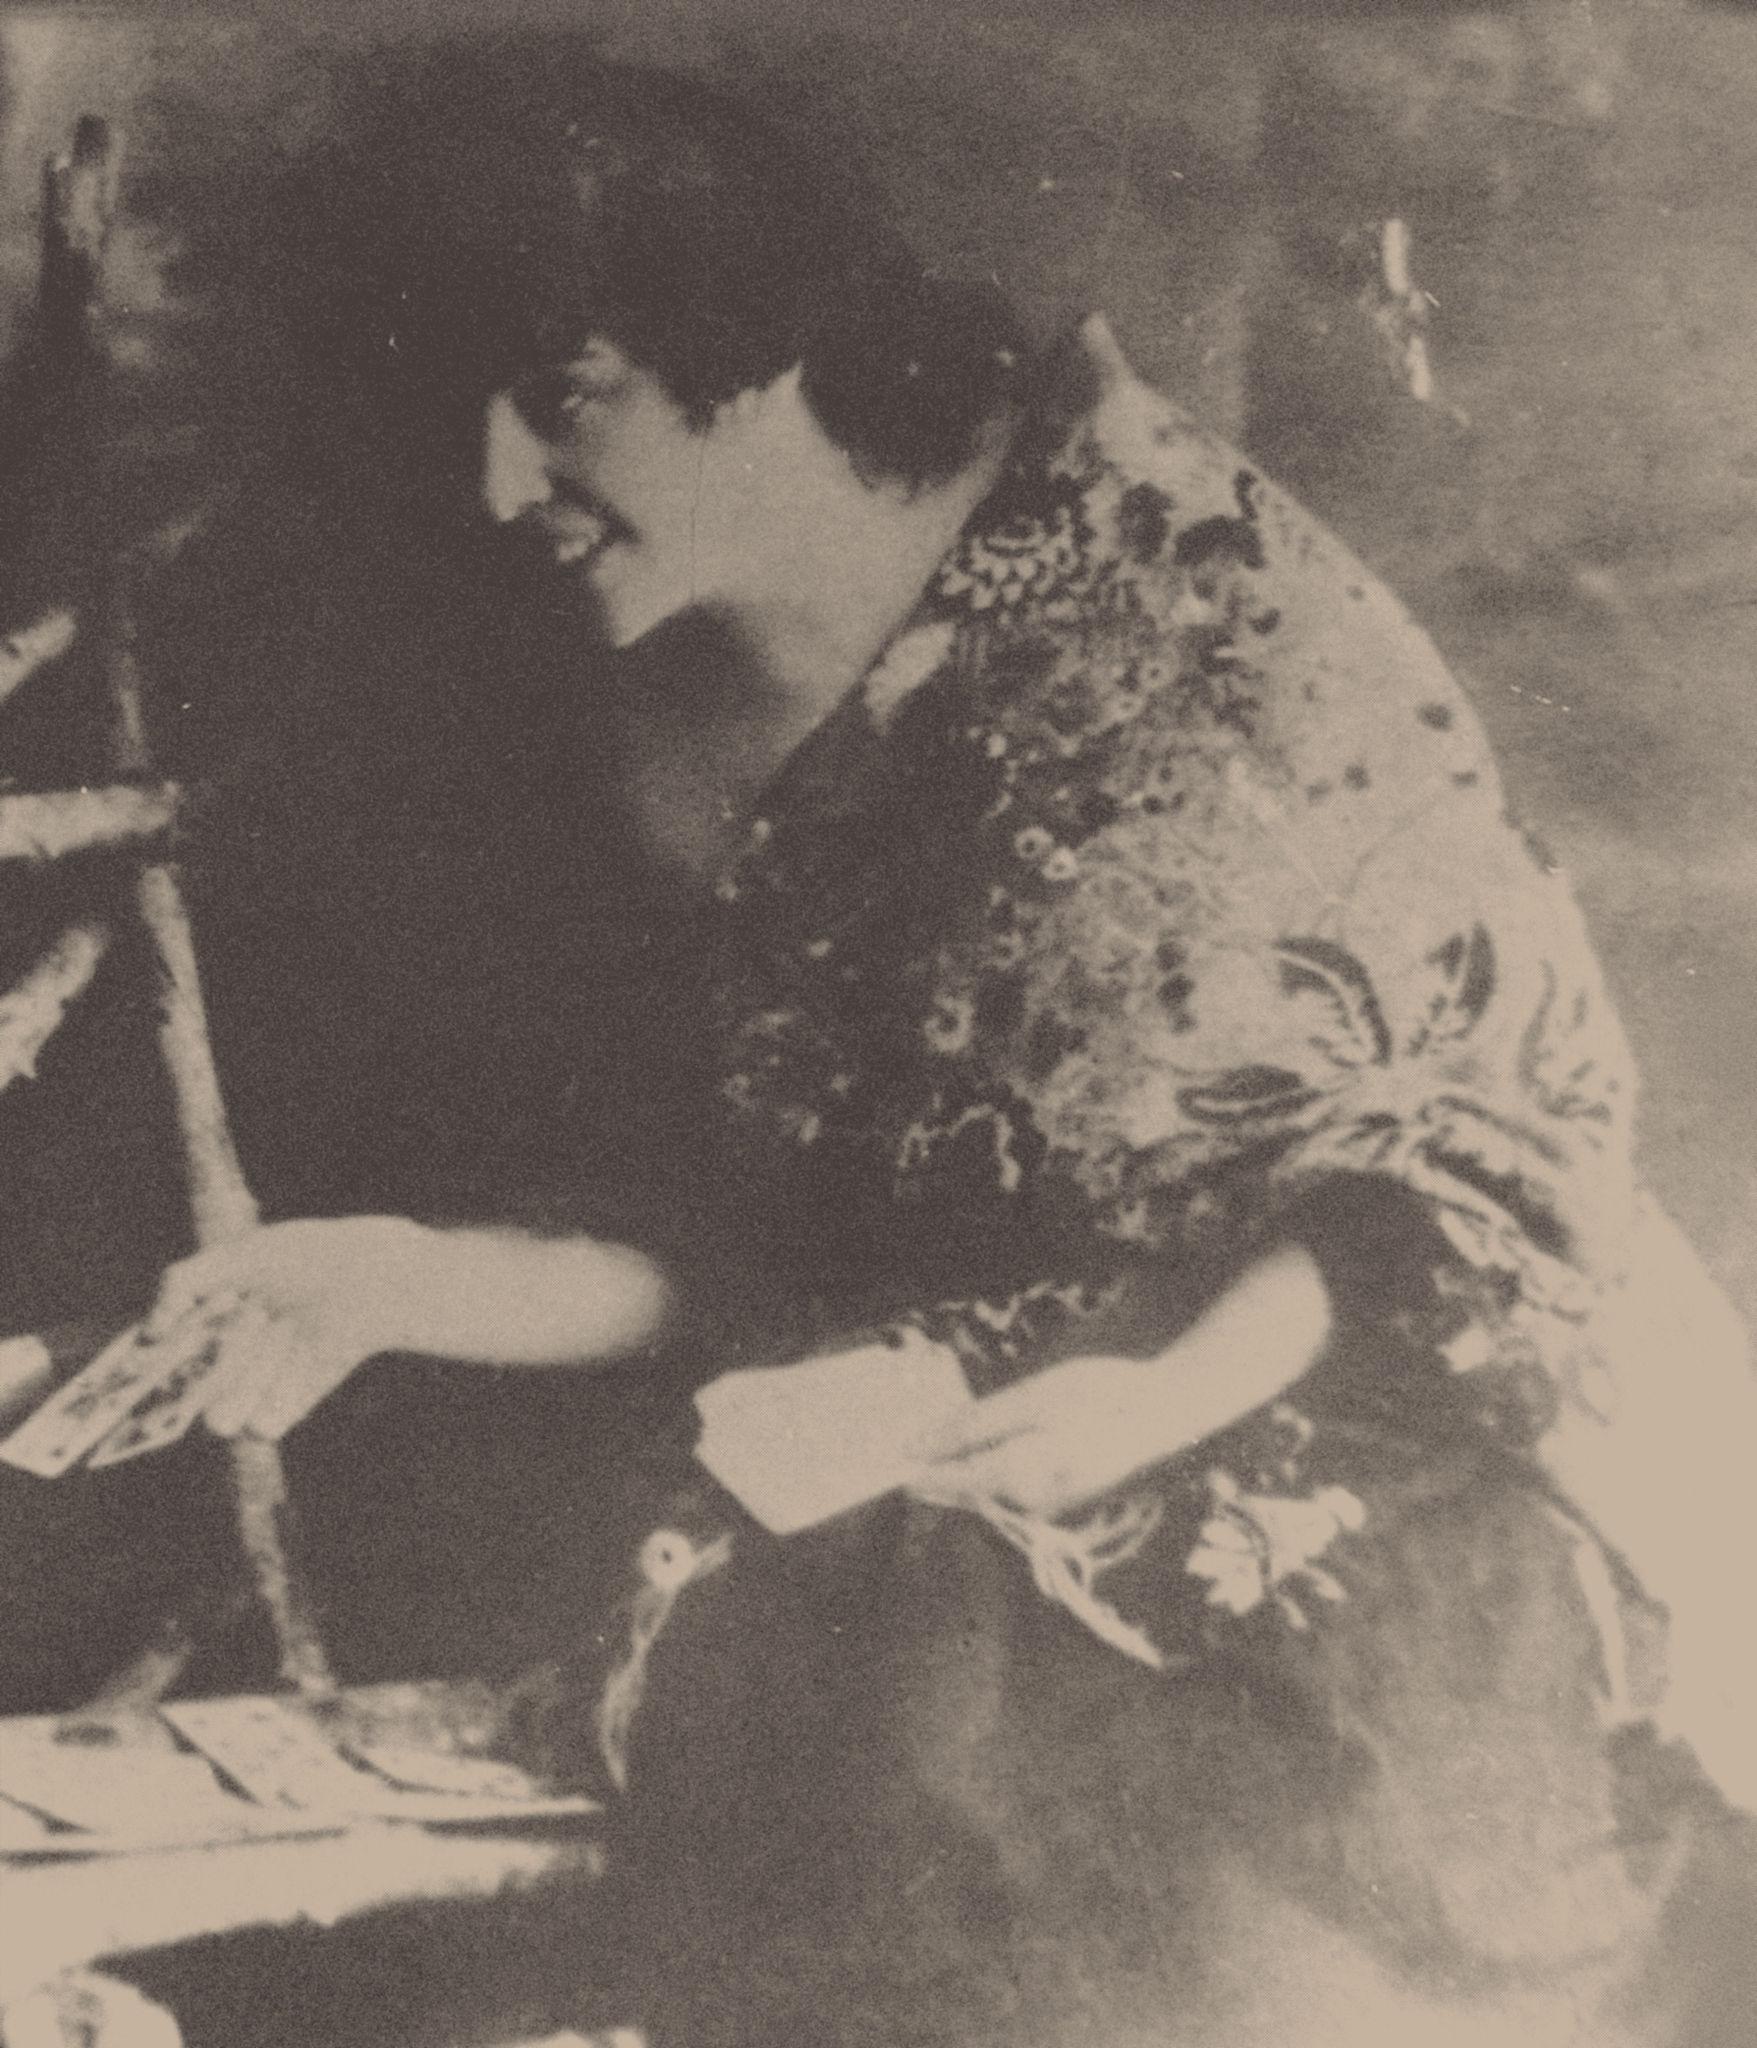 Мария Михайловна Семёнова-Глебова, жена атамана Семёнова